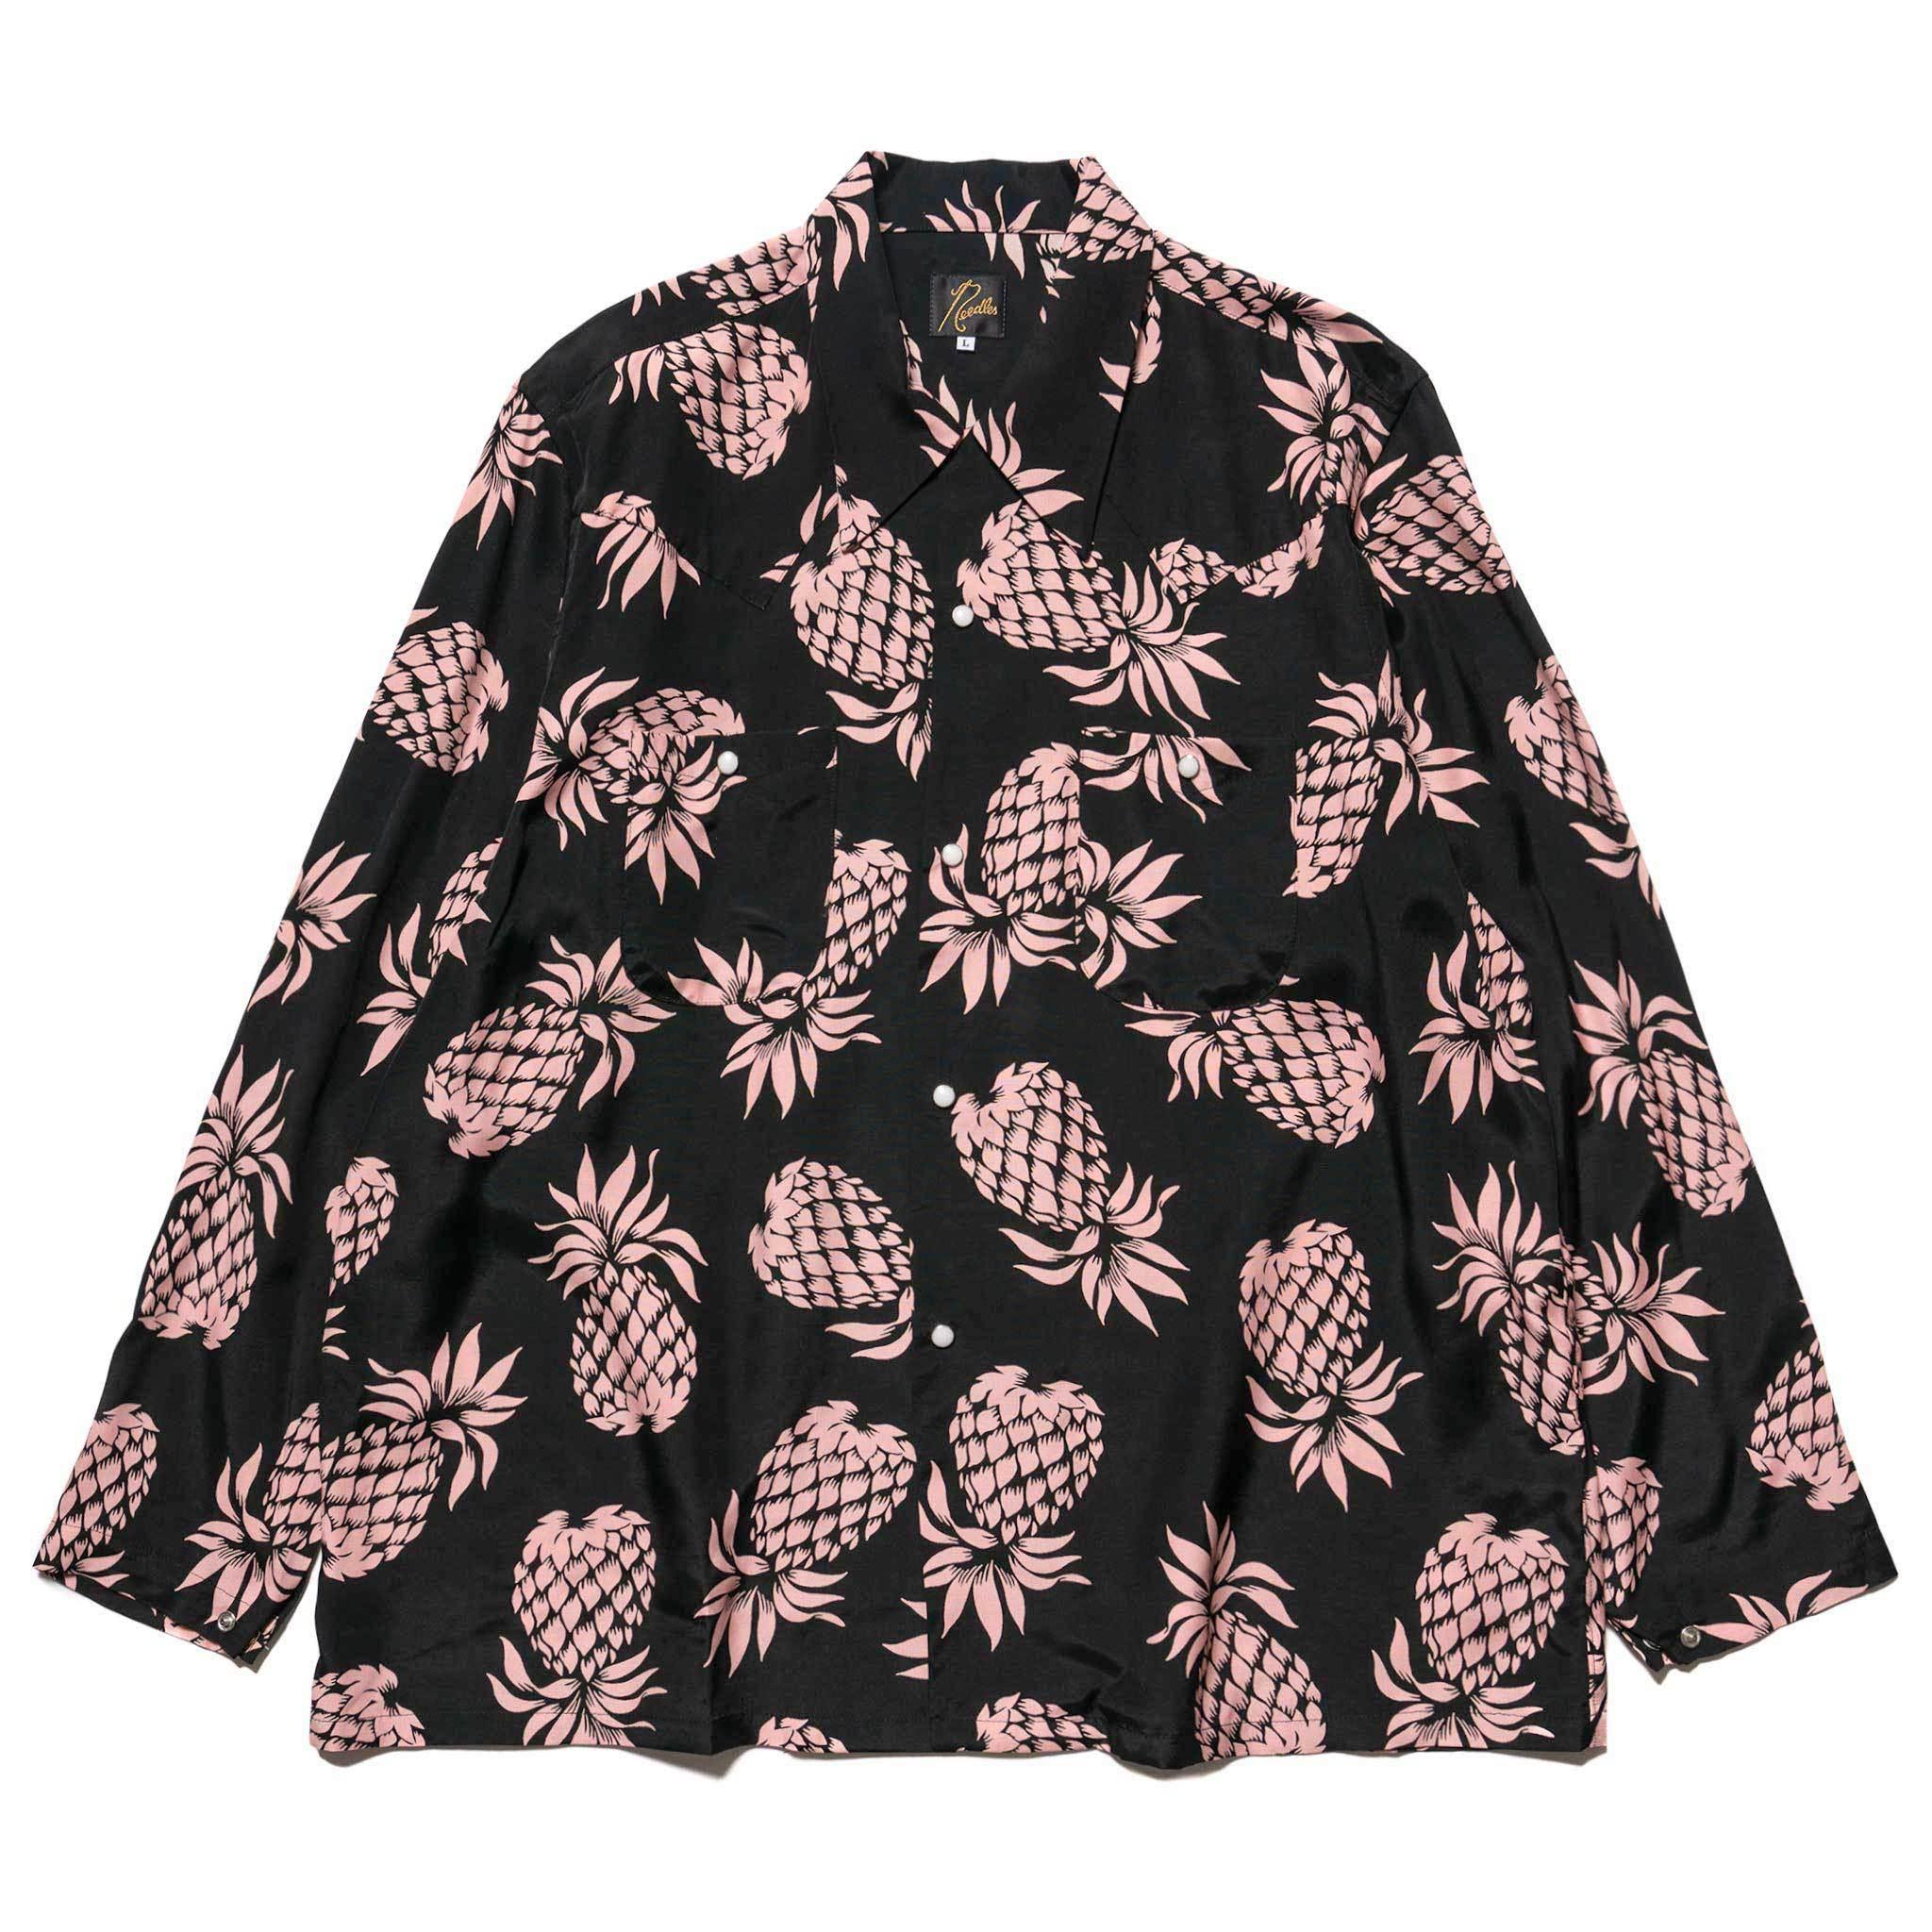 Needles-One-Up-Cowboy-Shirt-Rayon-Cloth-Sateen-Pineapple-Black.jpg